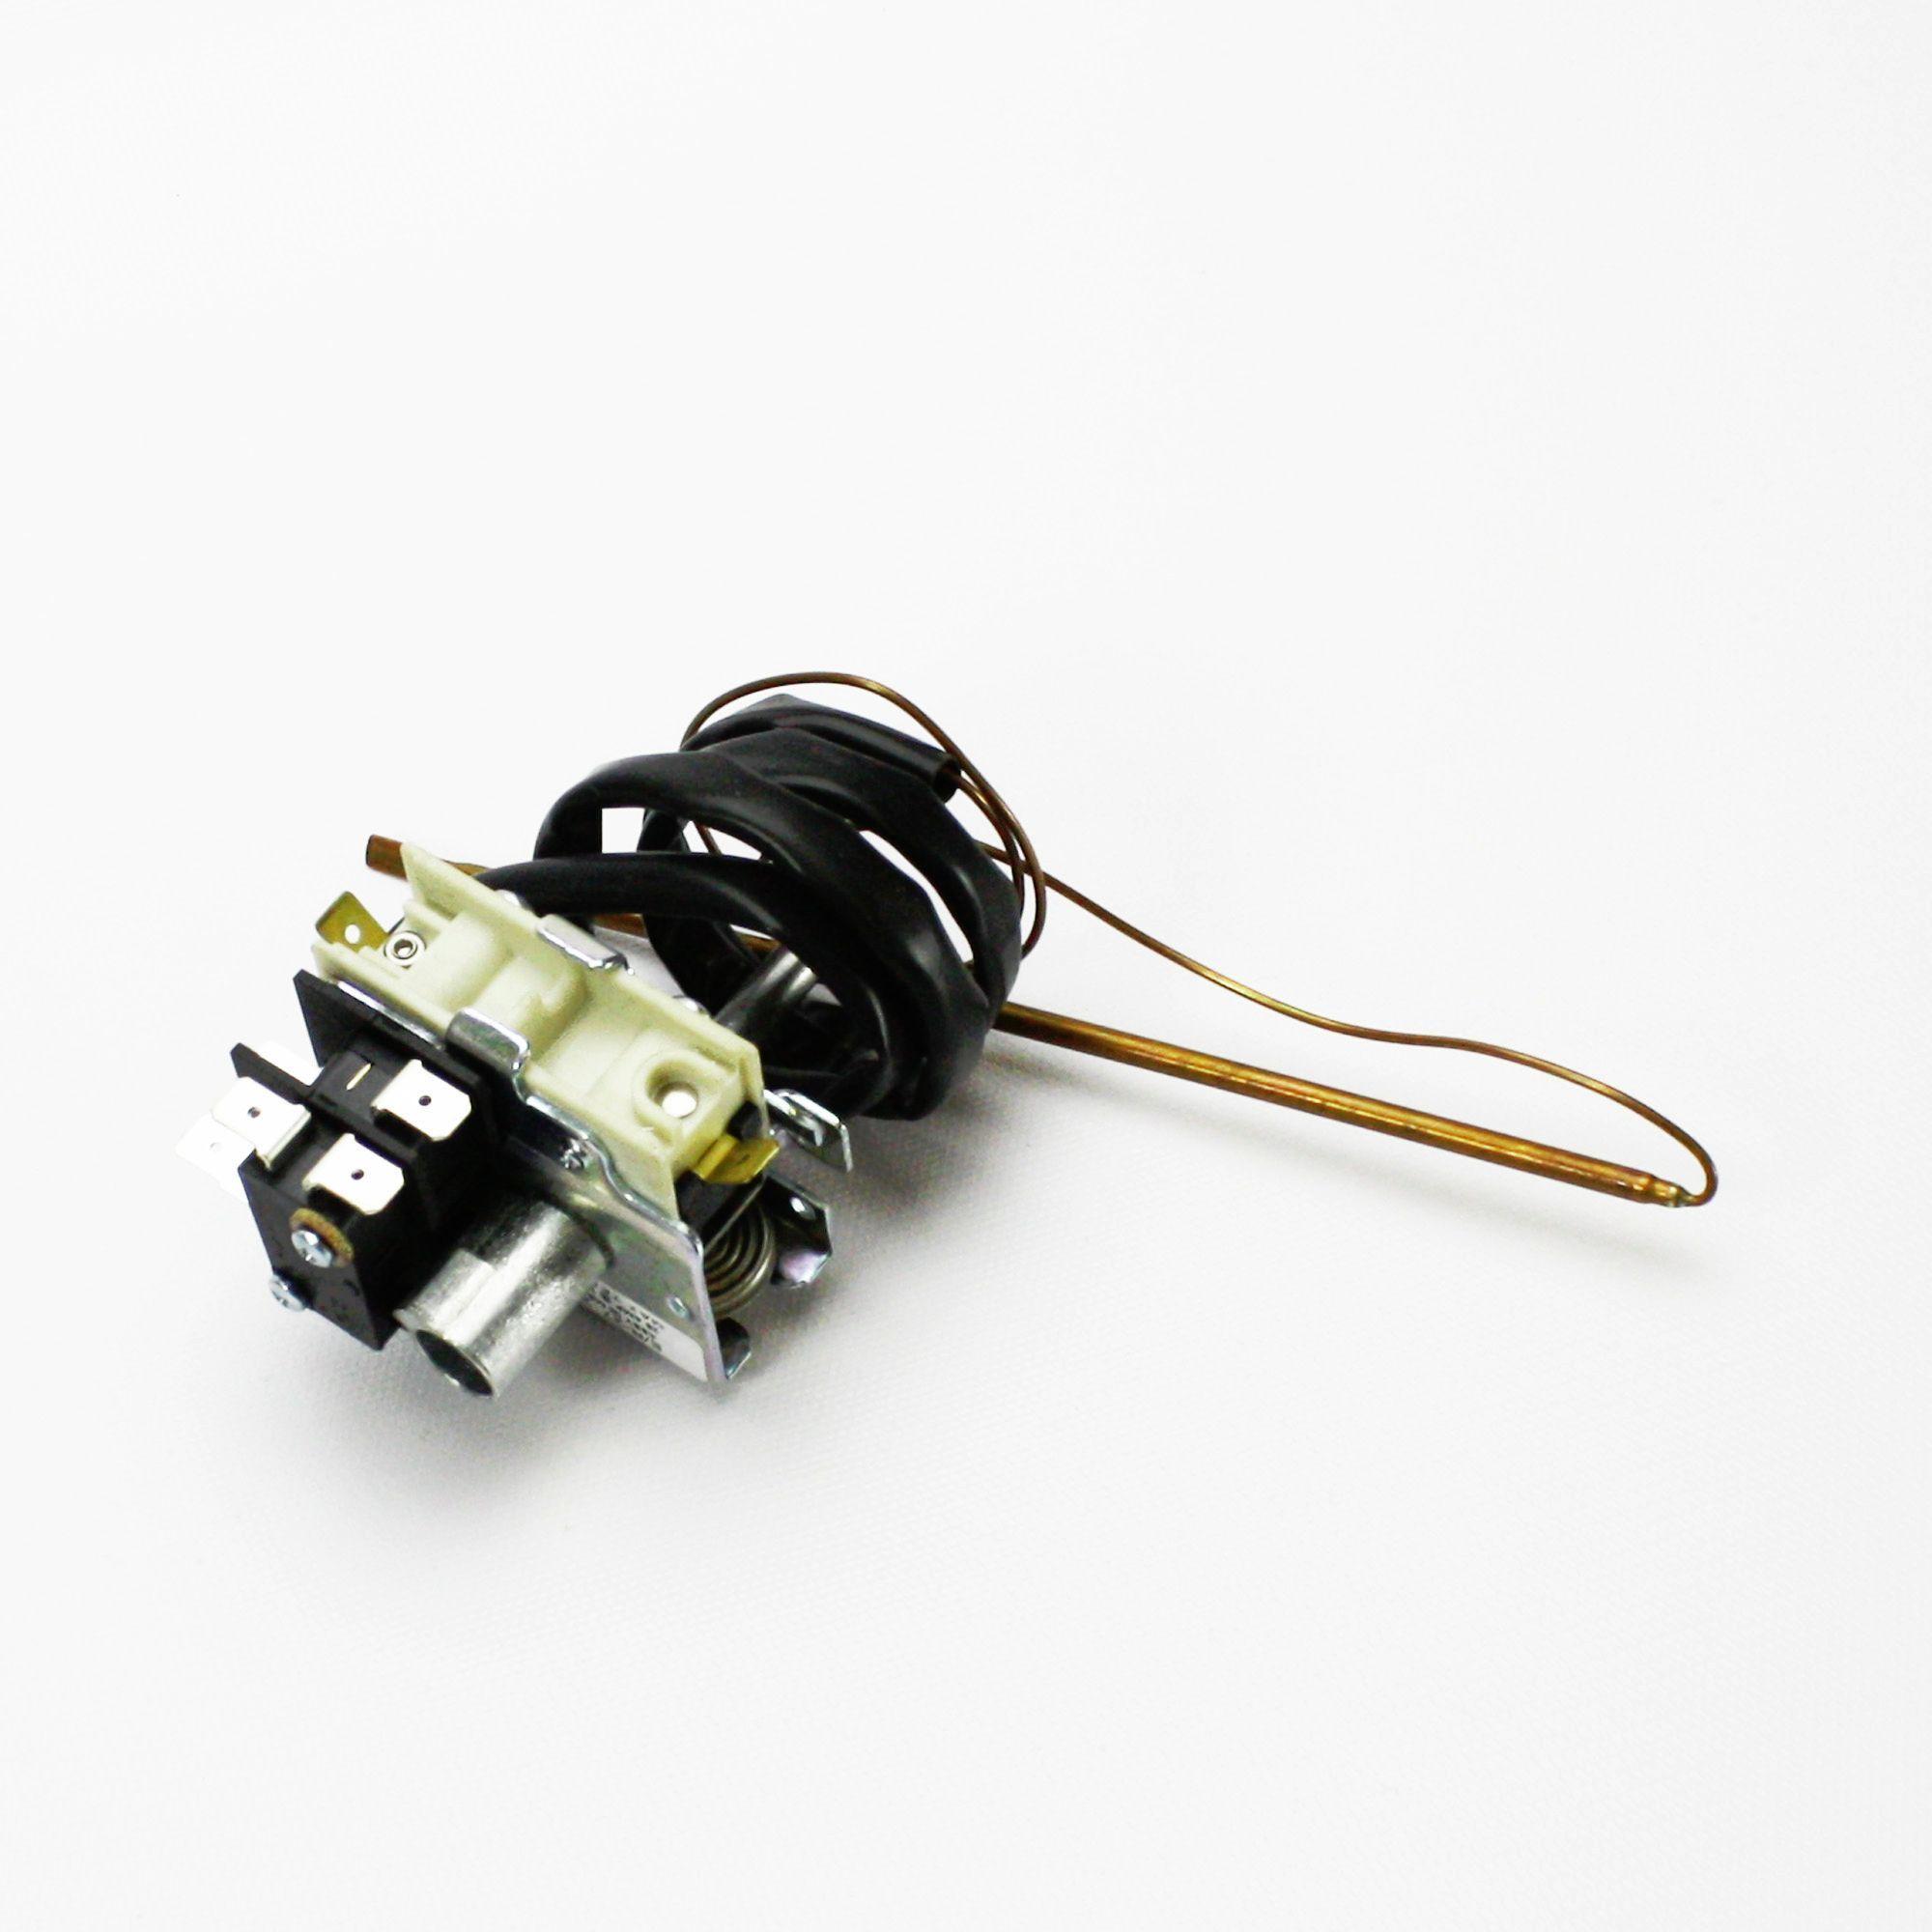 316215900 Genuine OEM Oven Thermostat & Probe